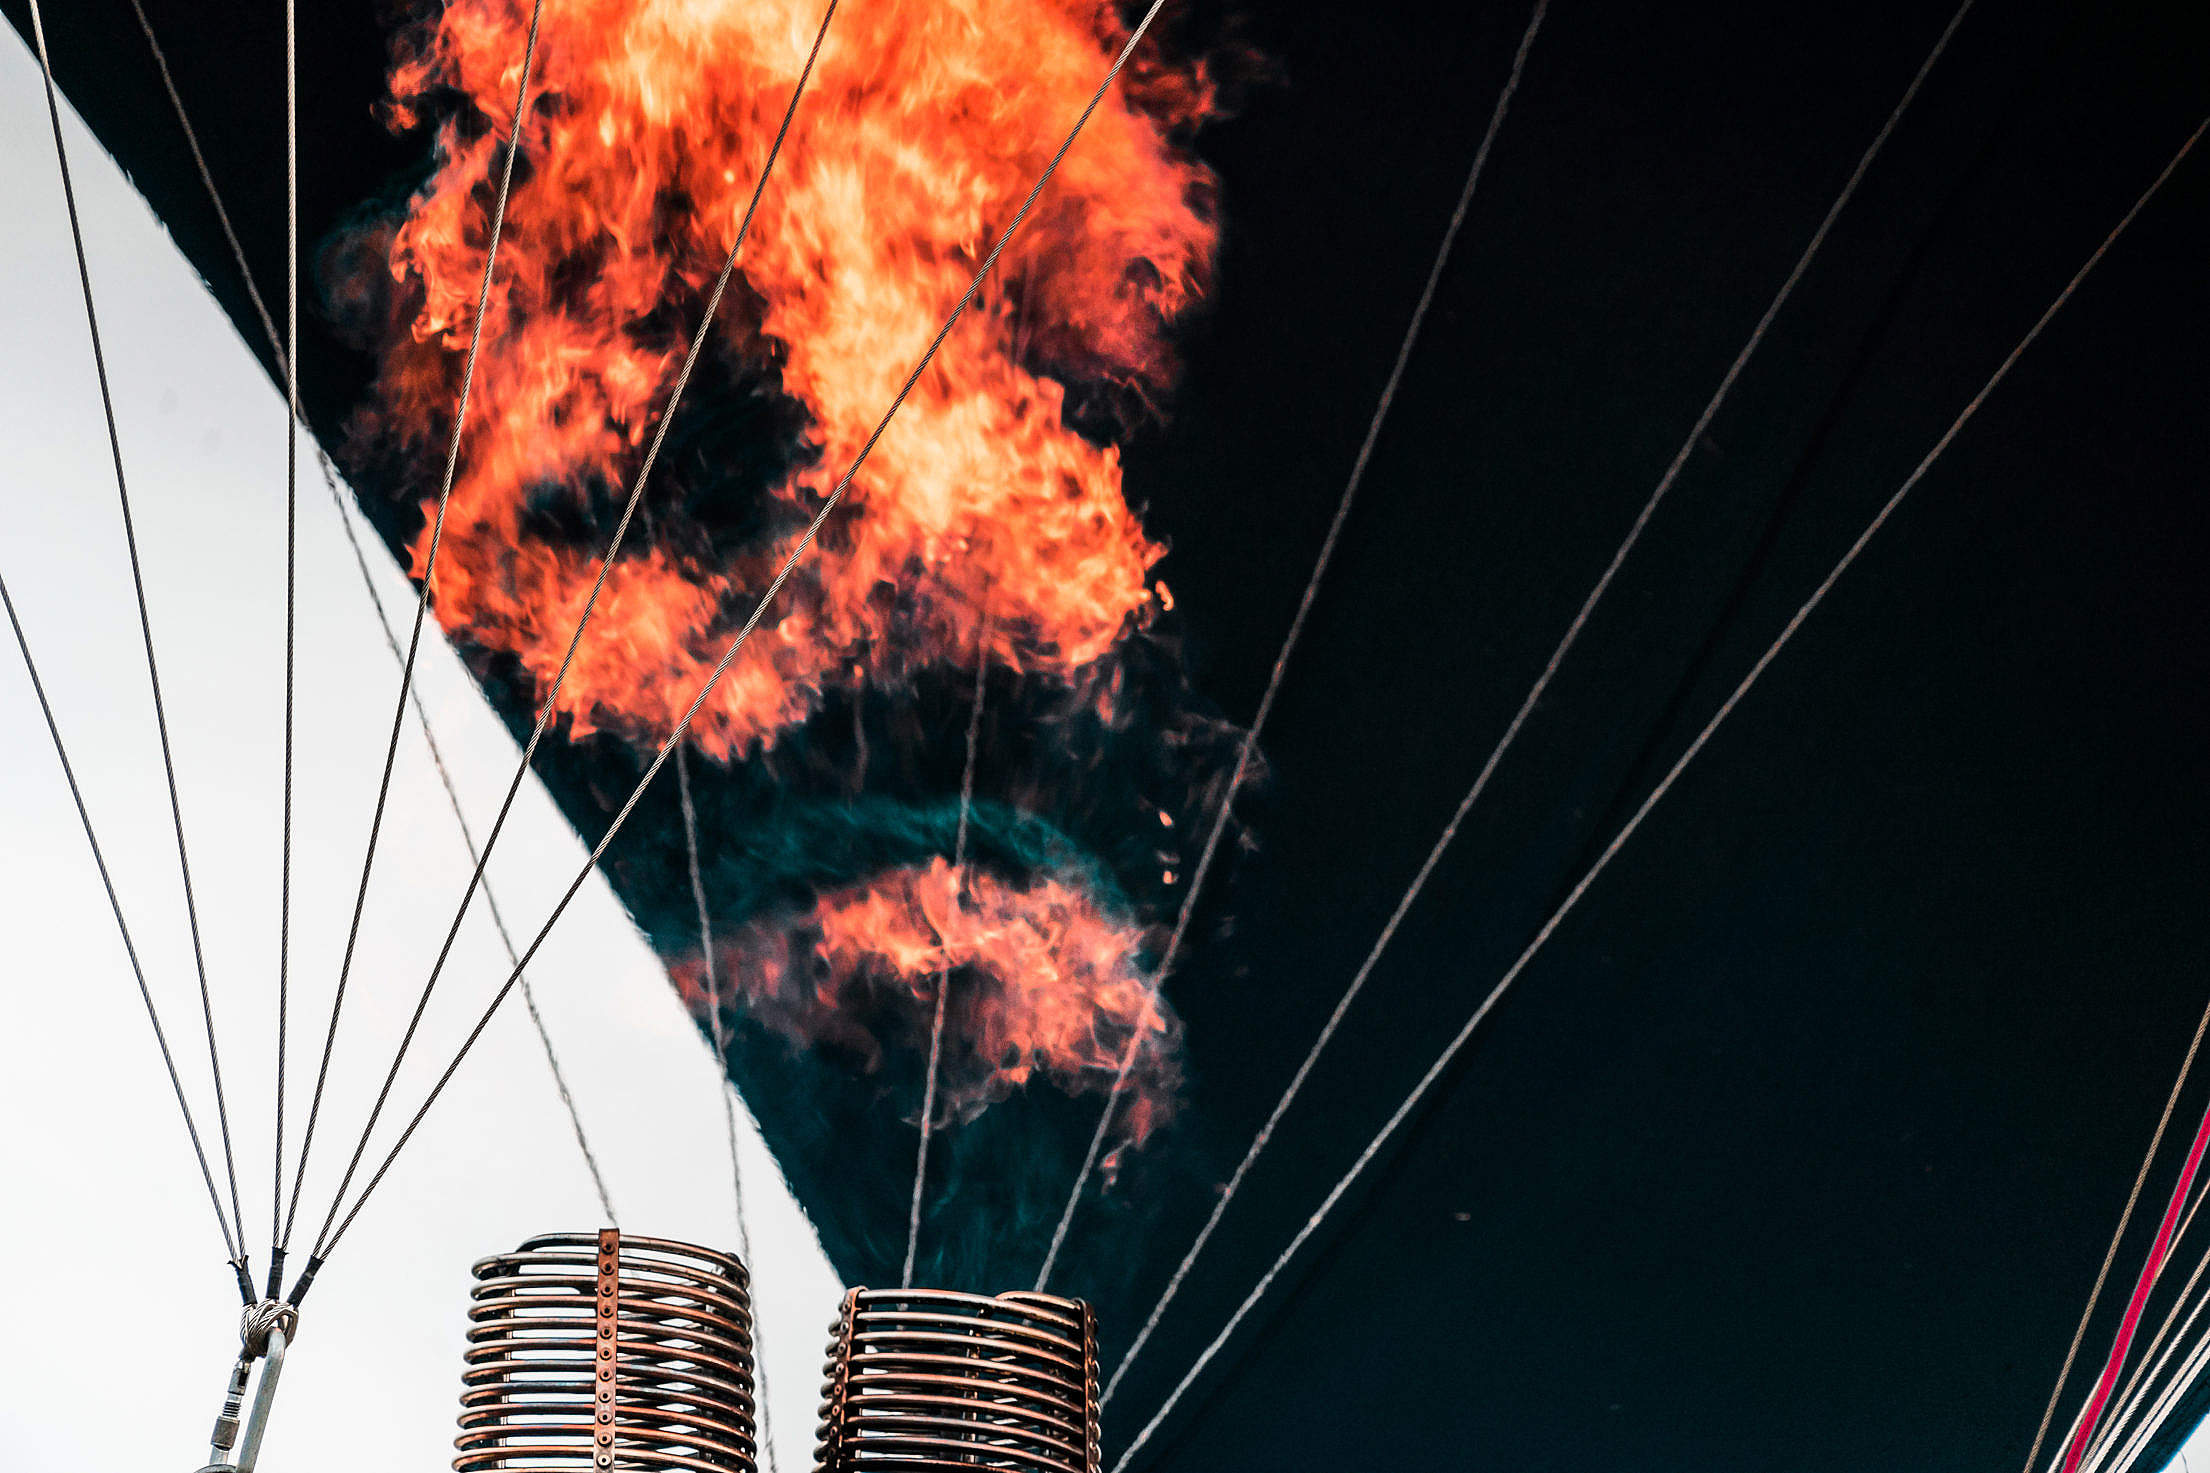 Hot Air Balloon Free Stock Photo